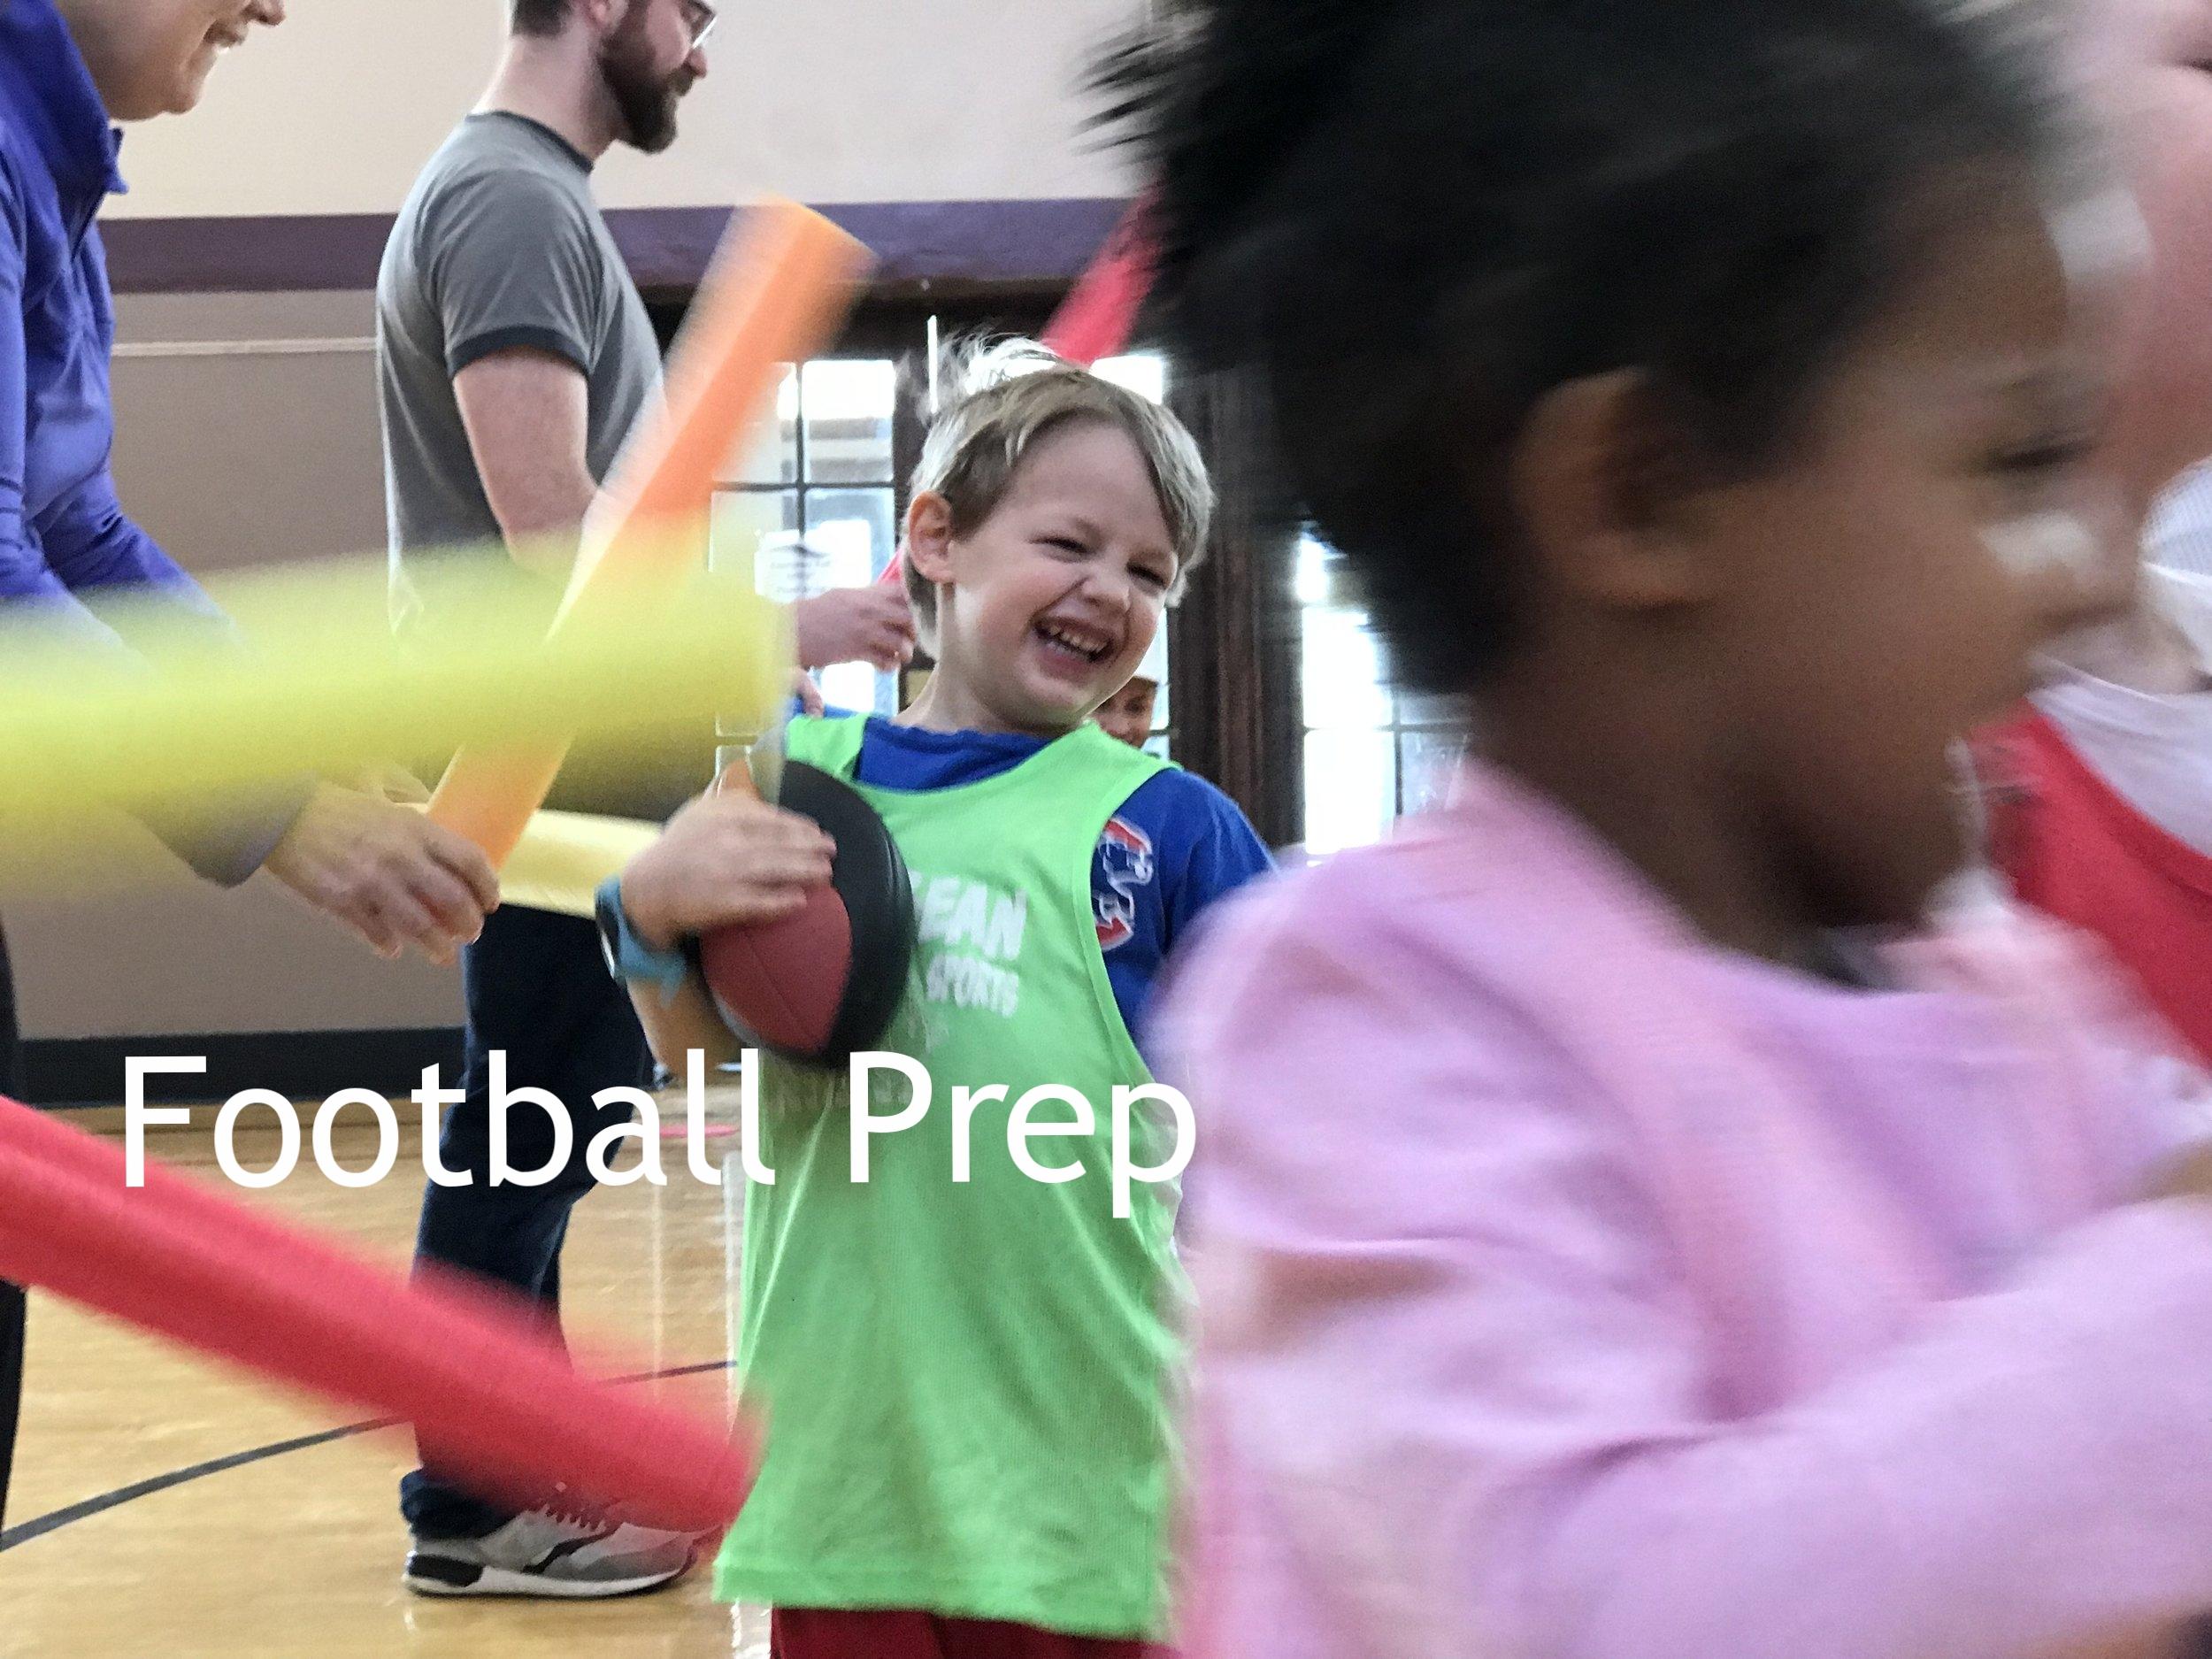 Children running through noodles with footballs